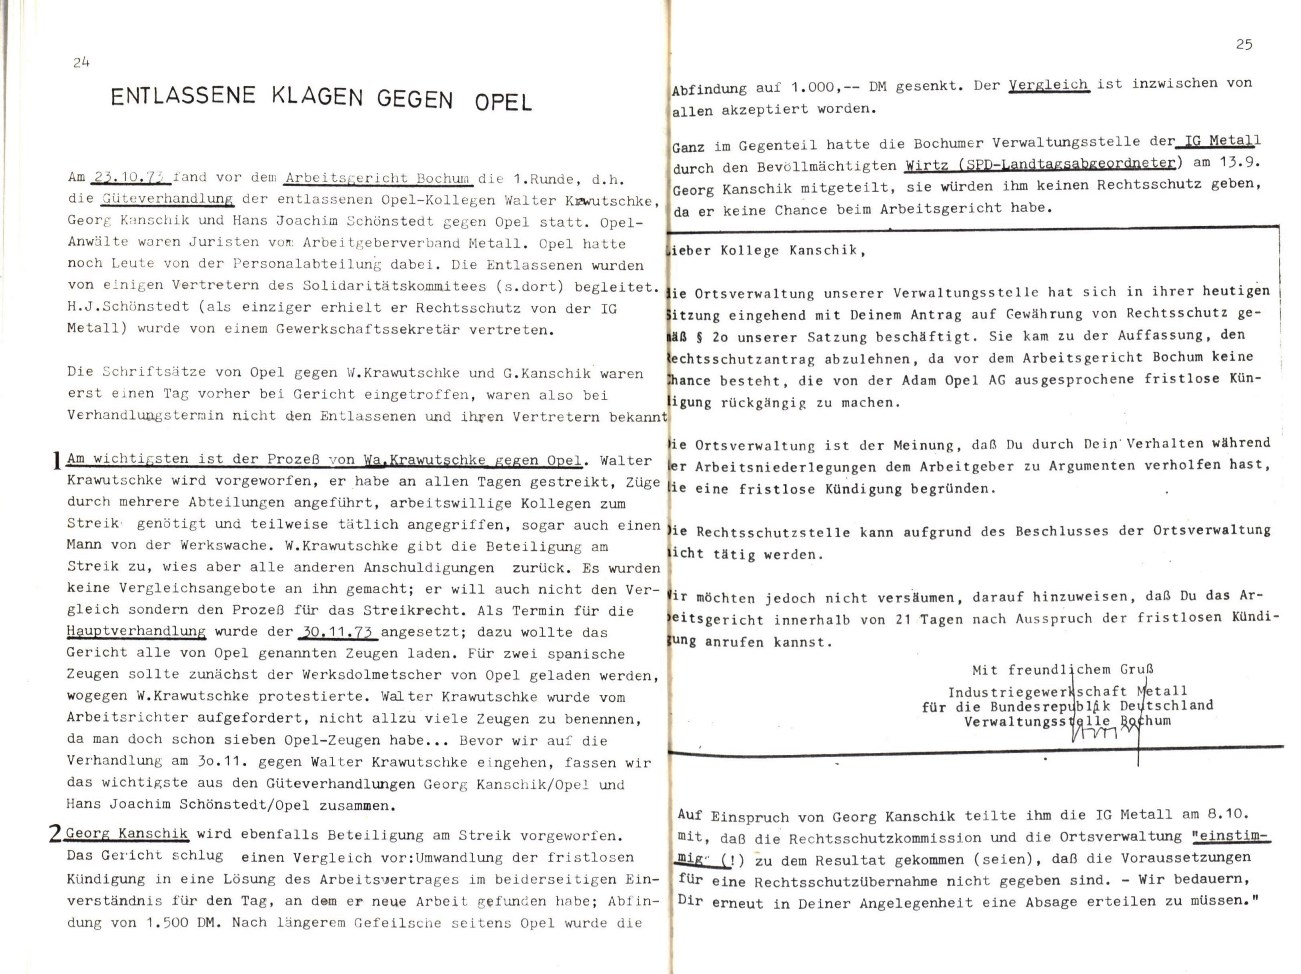 Bochum_IGM_Opel_PG_Opel_streikt_1973_014